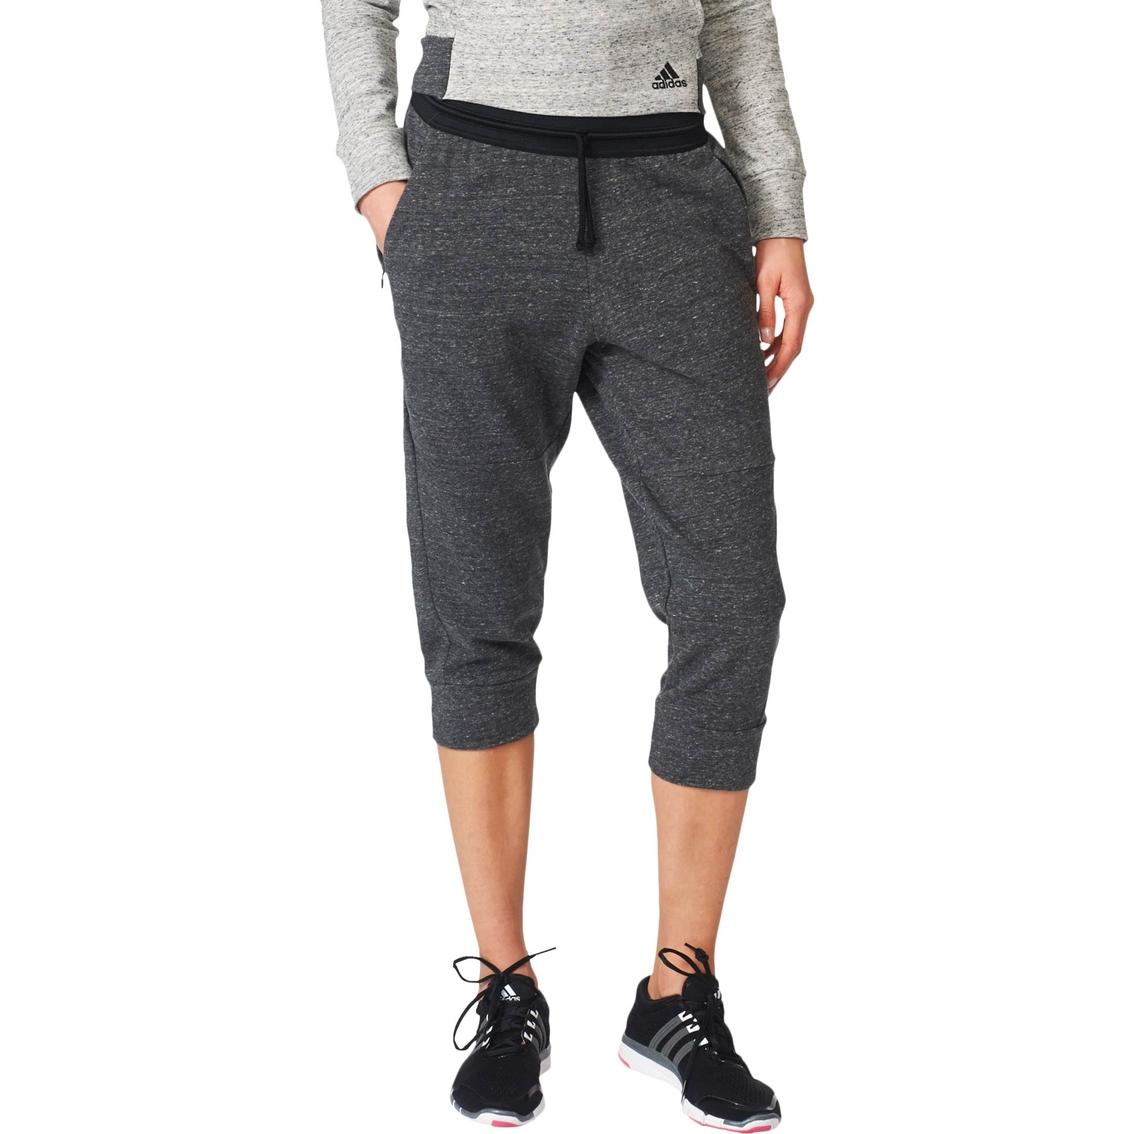 9abdcb5c702 Adidas Cotton Fleece Three Quarter Pants | Pants & Capris | Apparel ...